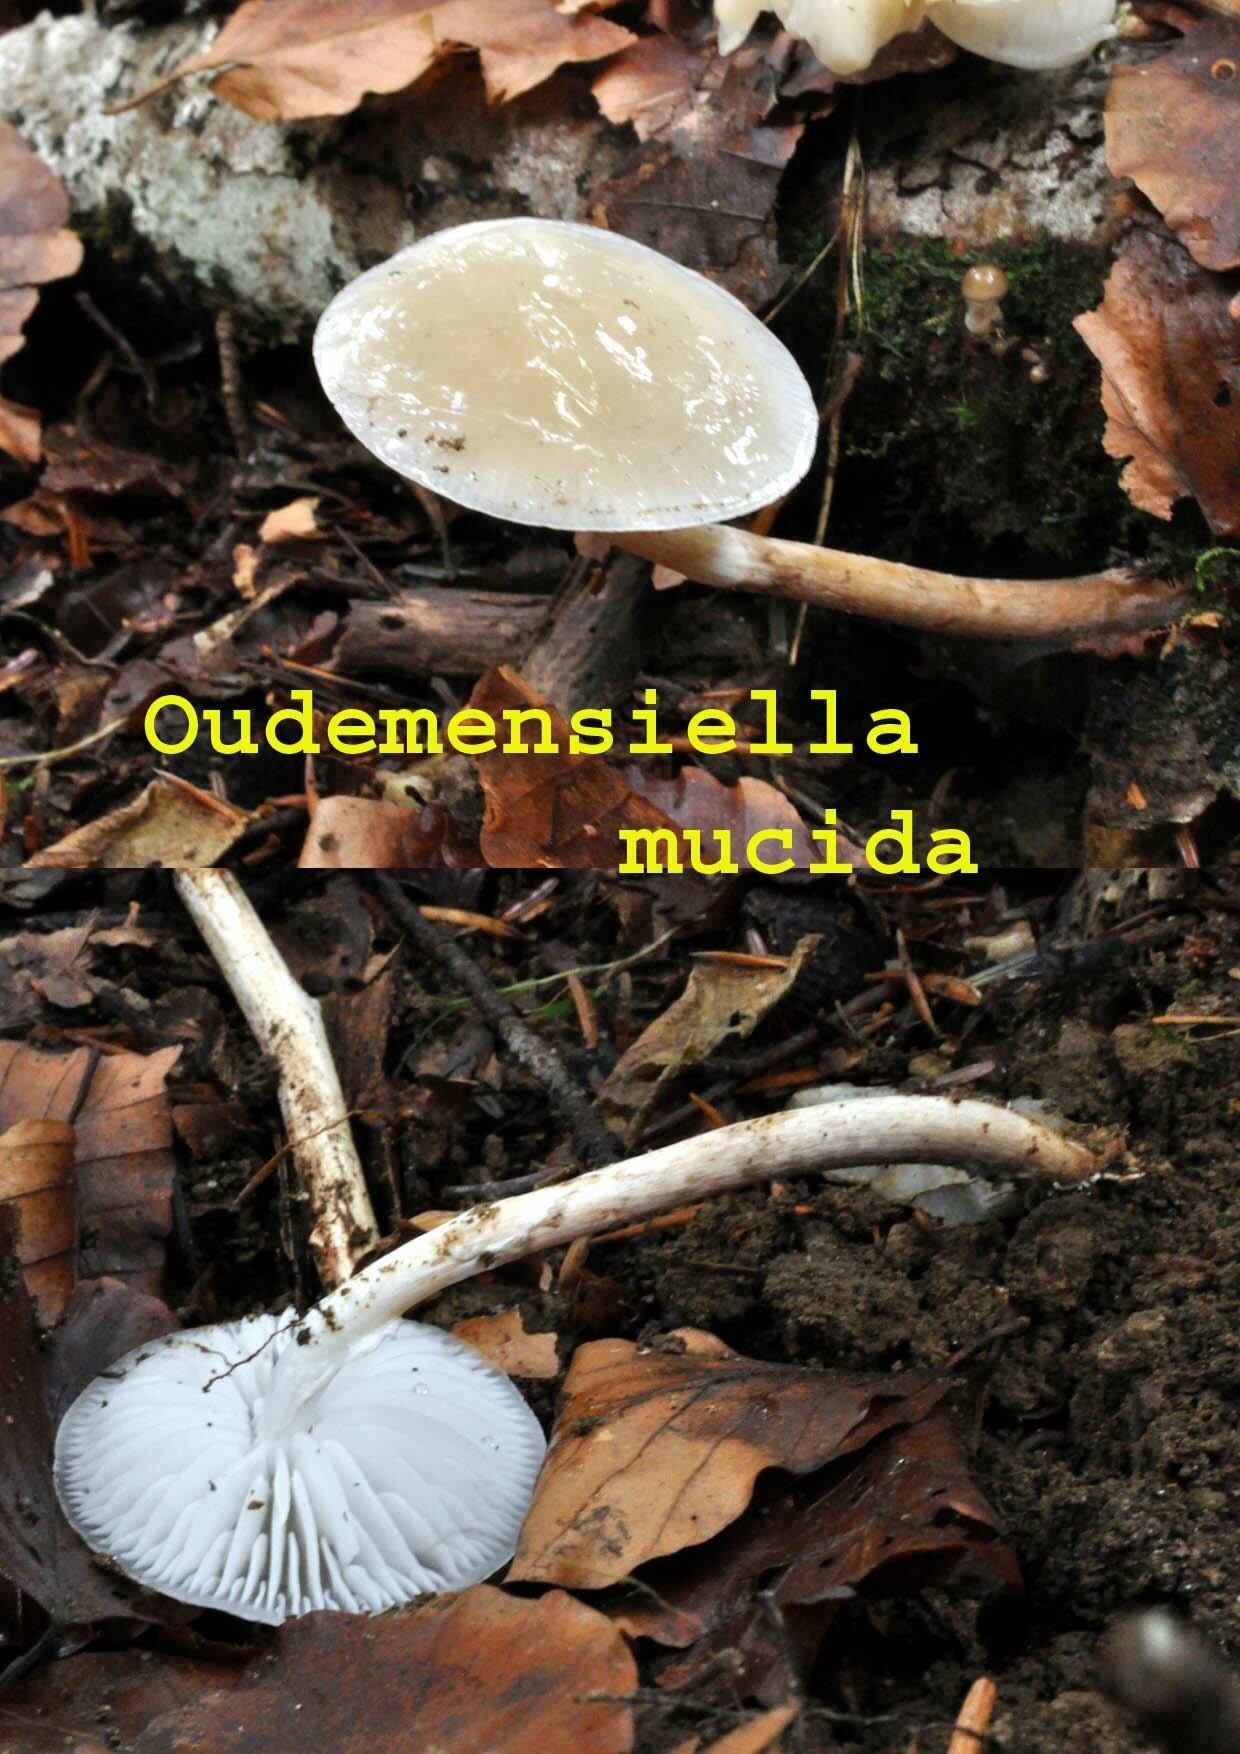 Oudemensiella mucida